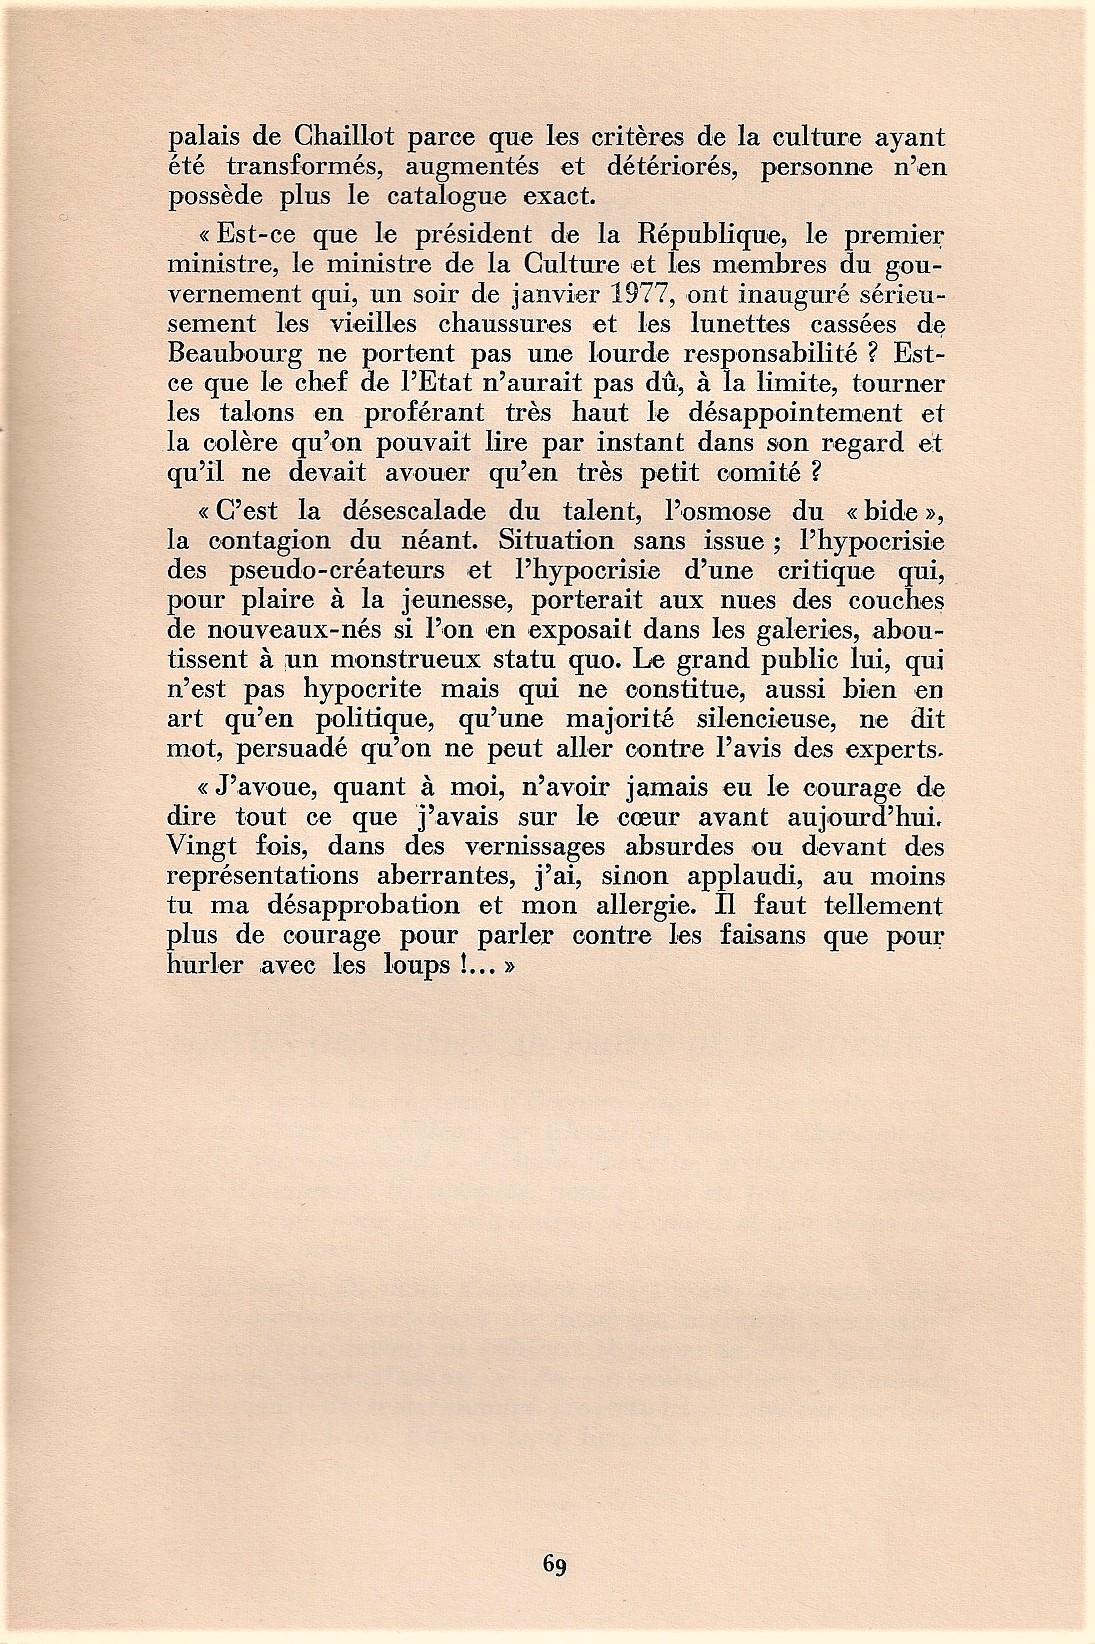 versini-page-69.jpg